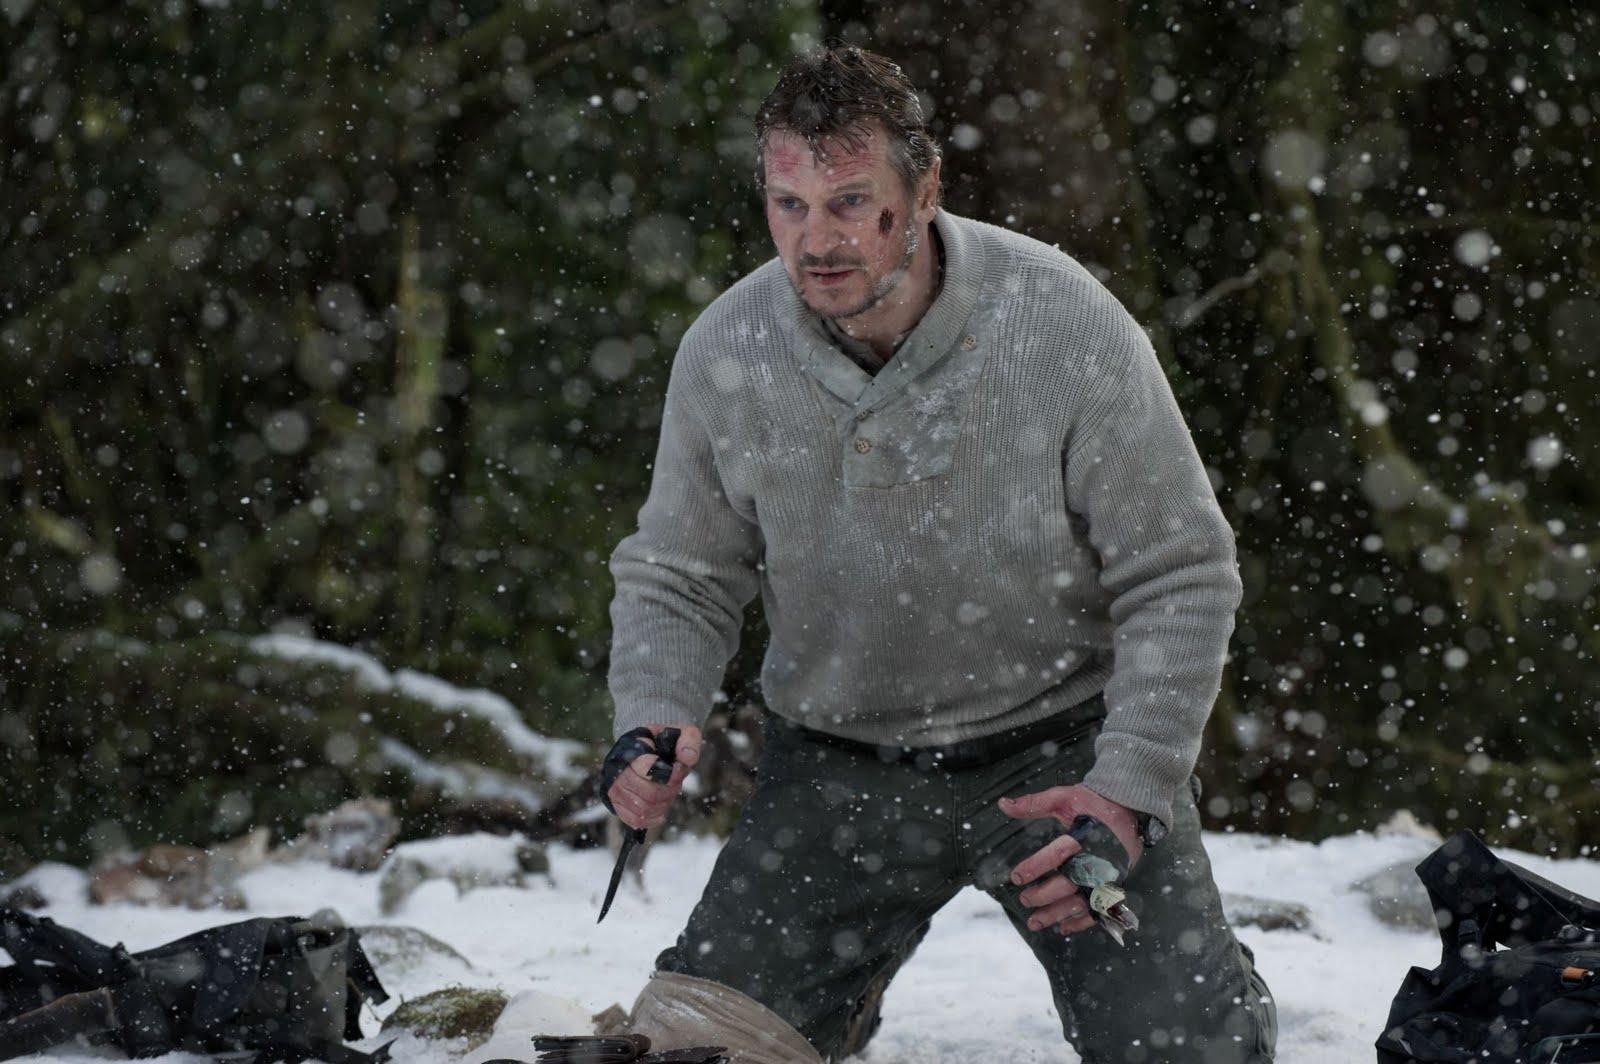 http://3.bp.blogspot.com/-XSLriEq3yR8/TvgapCRYDjI/AAAAAAAAQIs/R9Yz3OHQjDc/s00/The-Grey-Liam-Neeson_John-Diaz-6.jpg